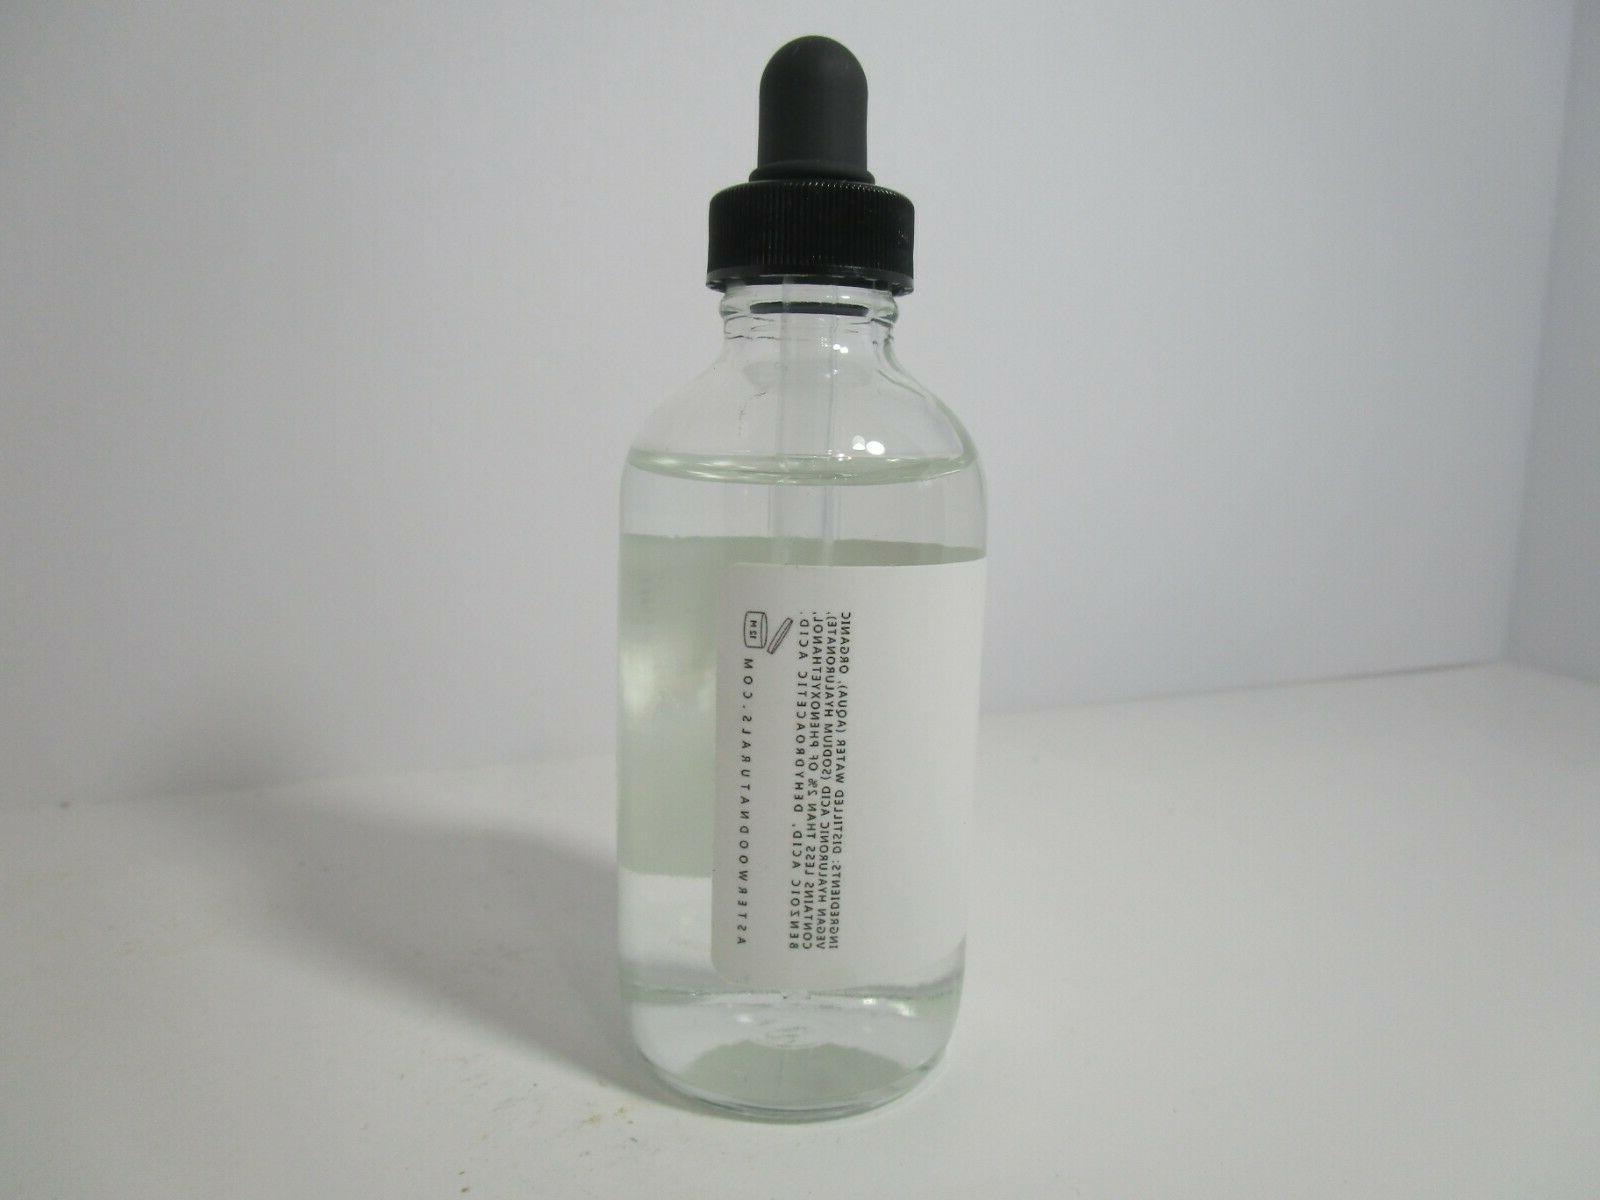 Asterwood Hyaluronic Serum Organic Anti Wrinkle, 4